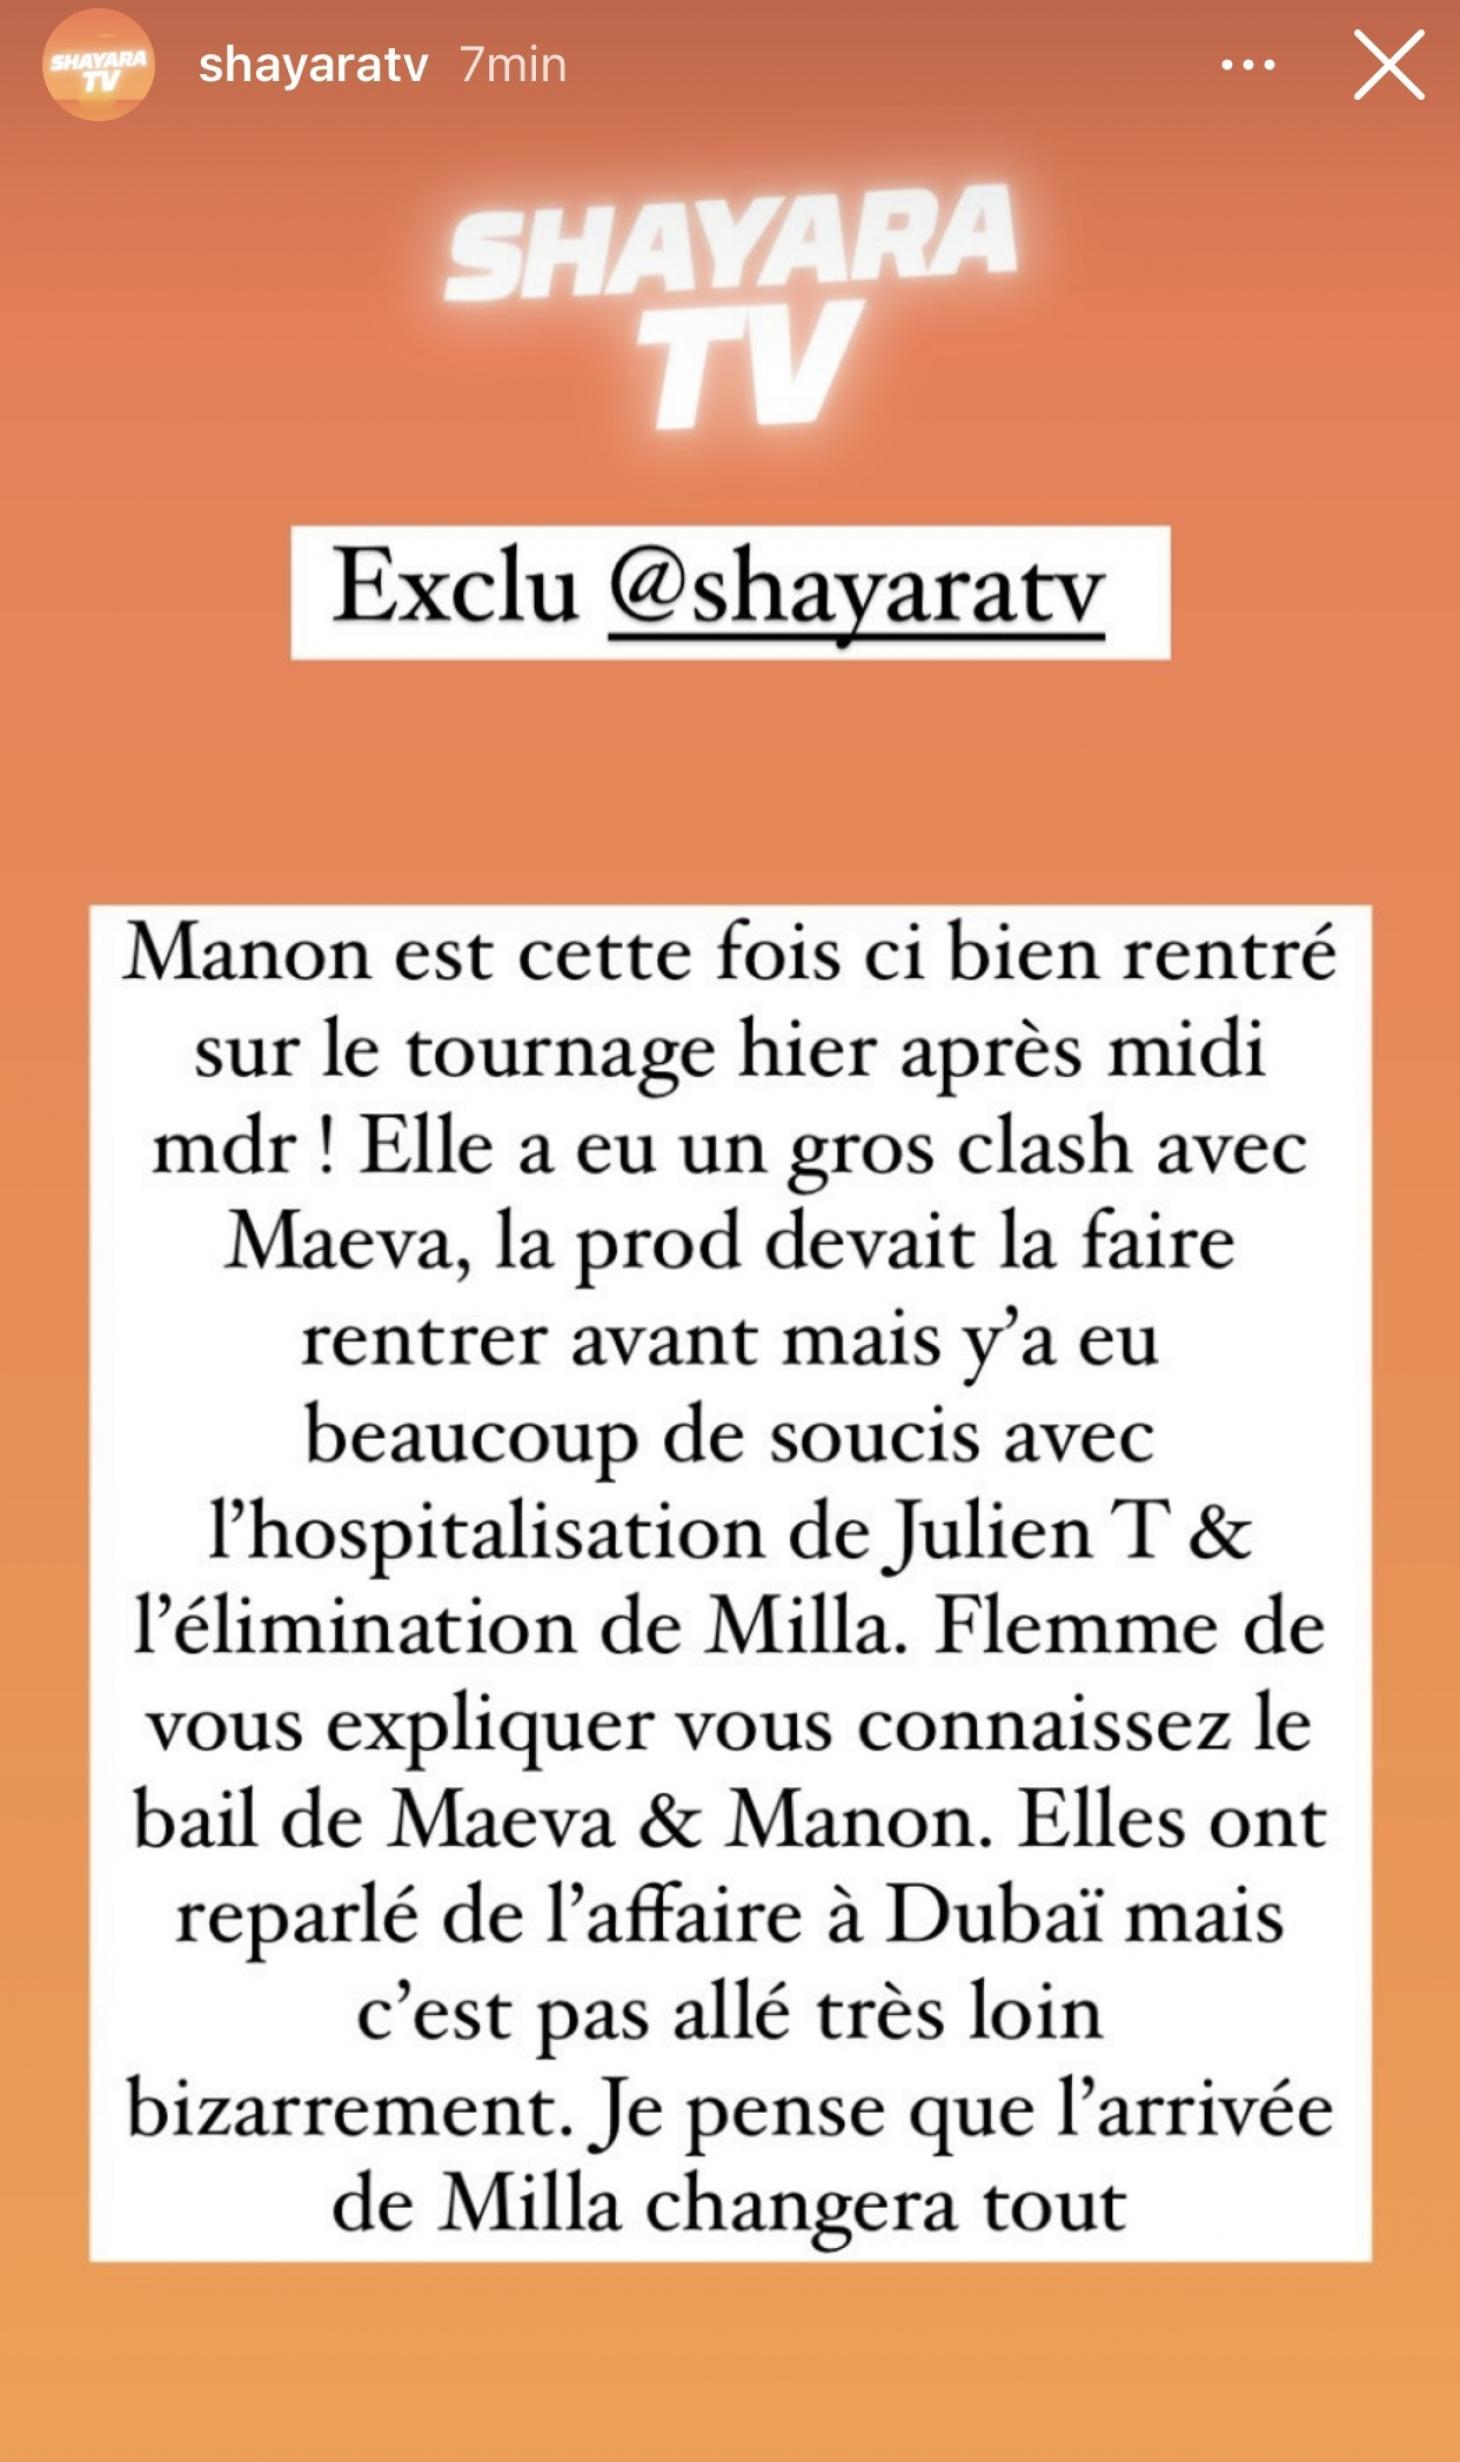 lmvsmonde6-manon-marsault-integre-la-villa-et-se-confronte-enfin-a-maeva-ghennam